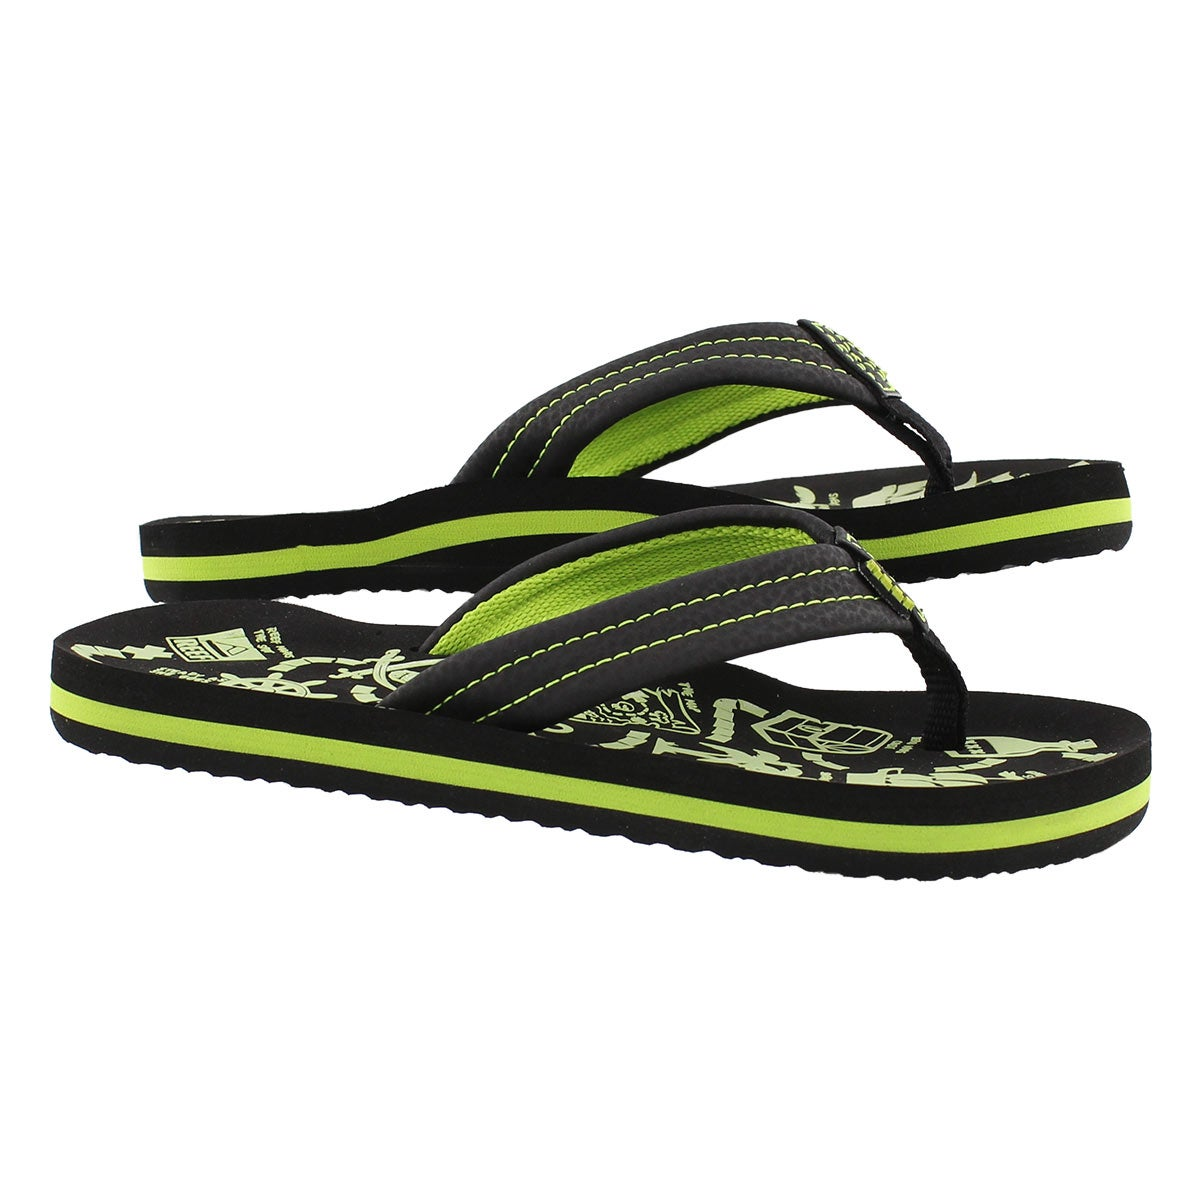 Sandale tong AHI Glow, noir/vert, garçon